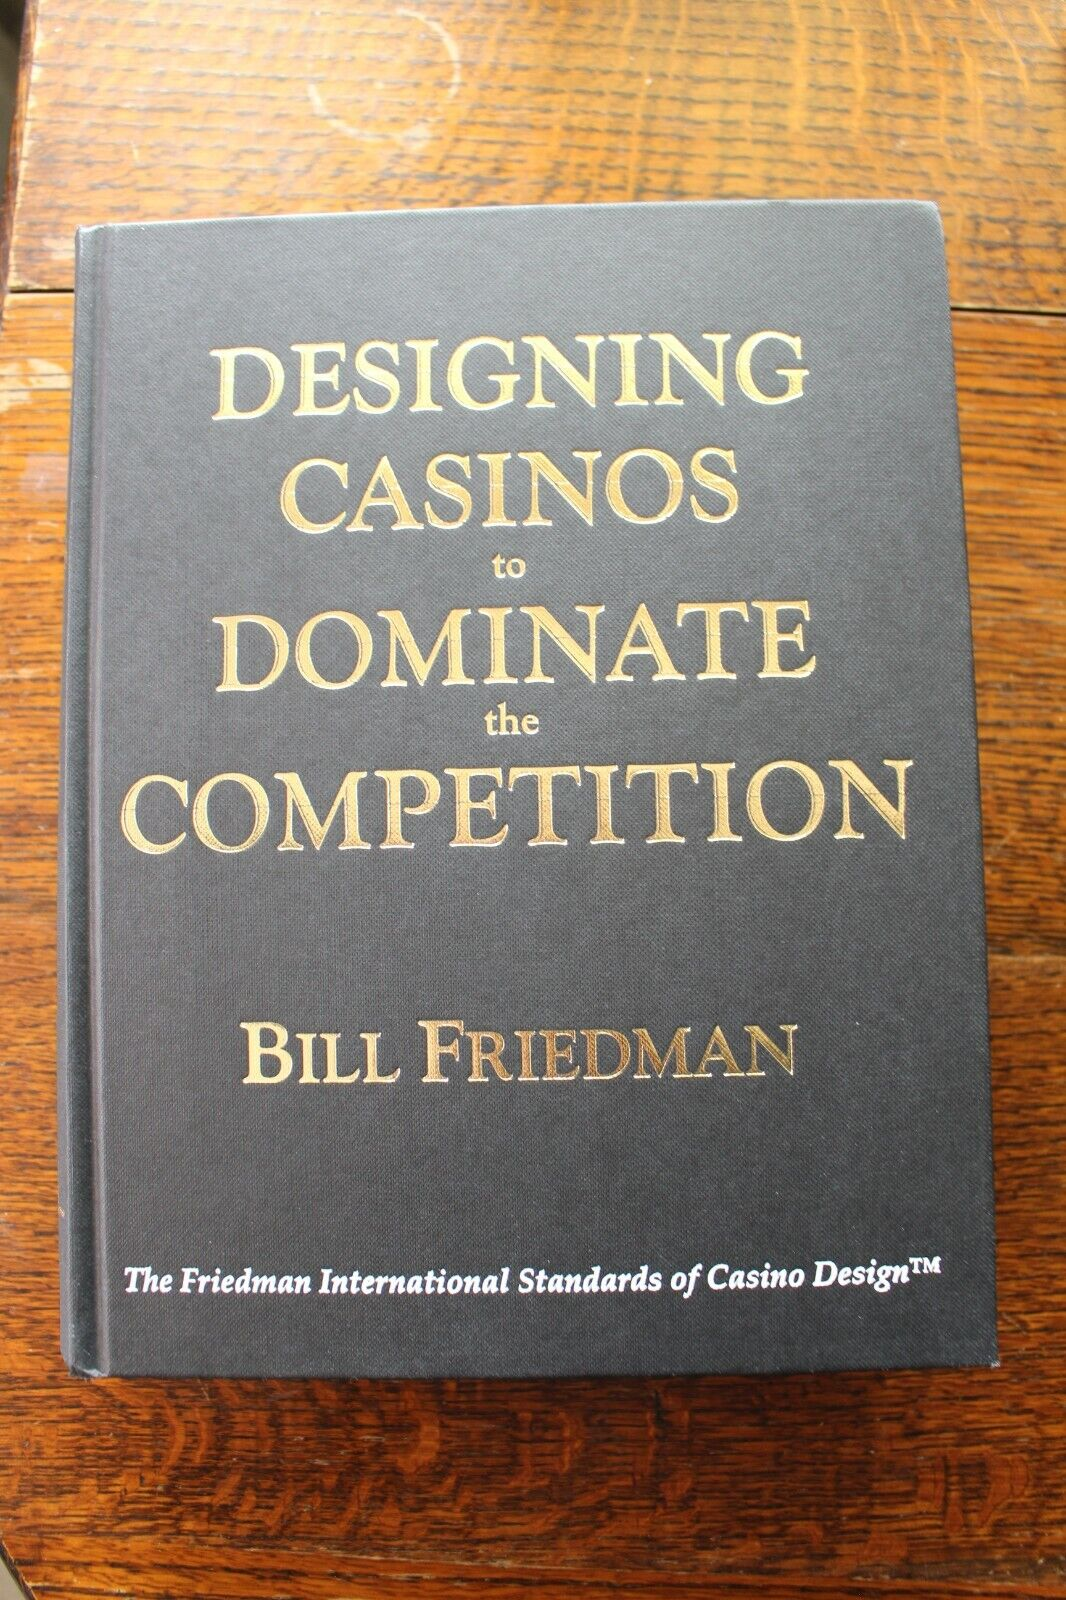 Casino casino competition design designing dominate friedman international standard free 2 play military shooter games